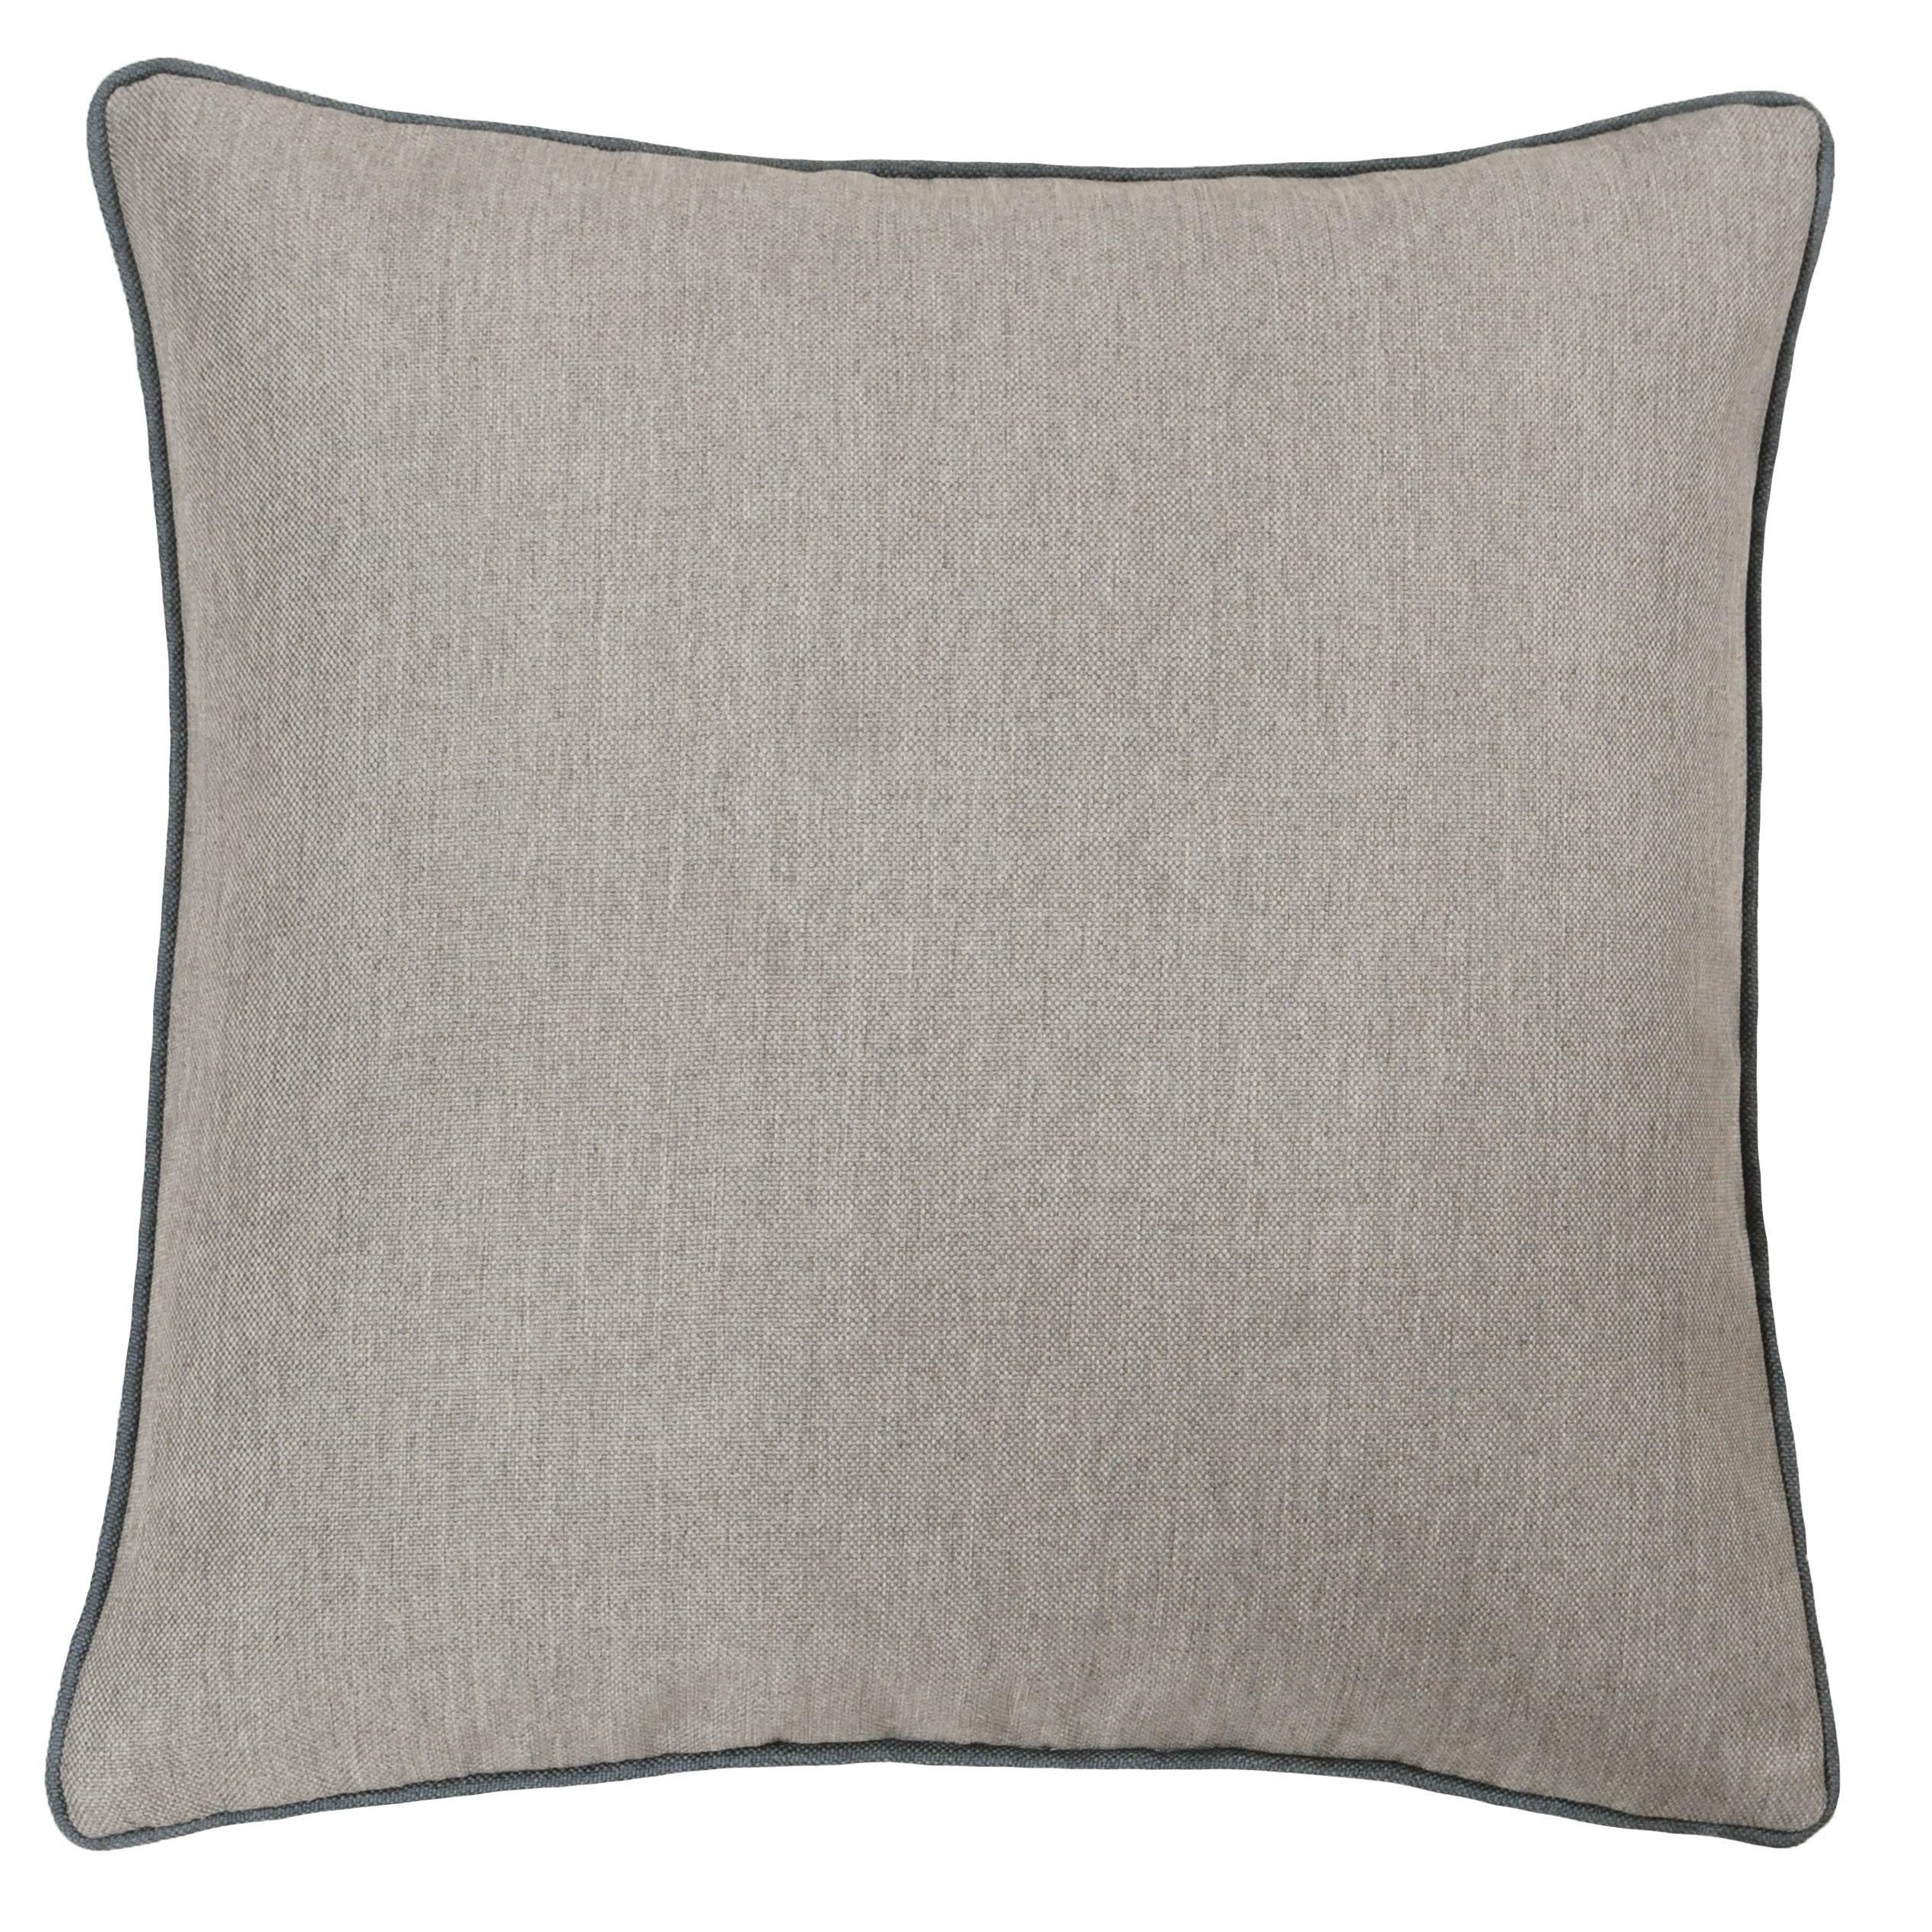 Bellucci 45X45 Poly Cushion Gra/Tob